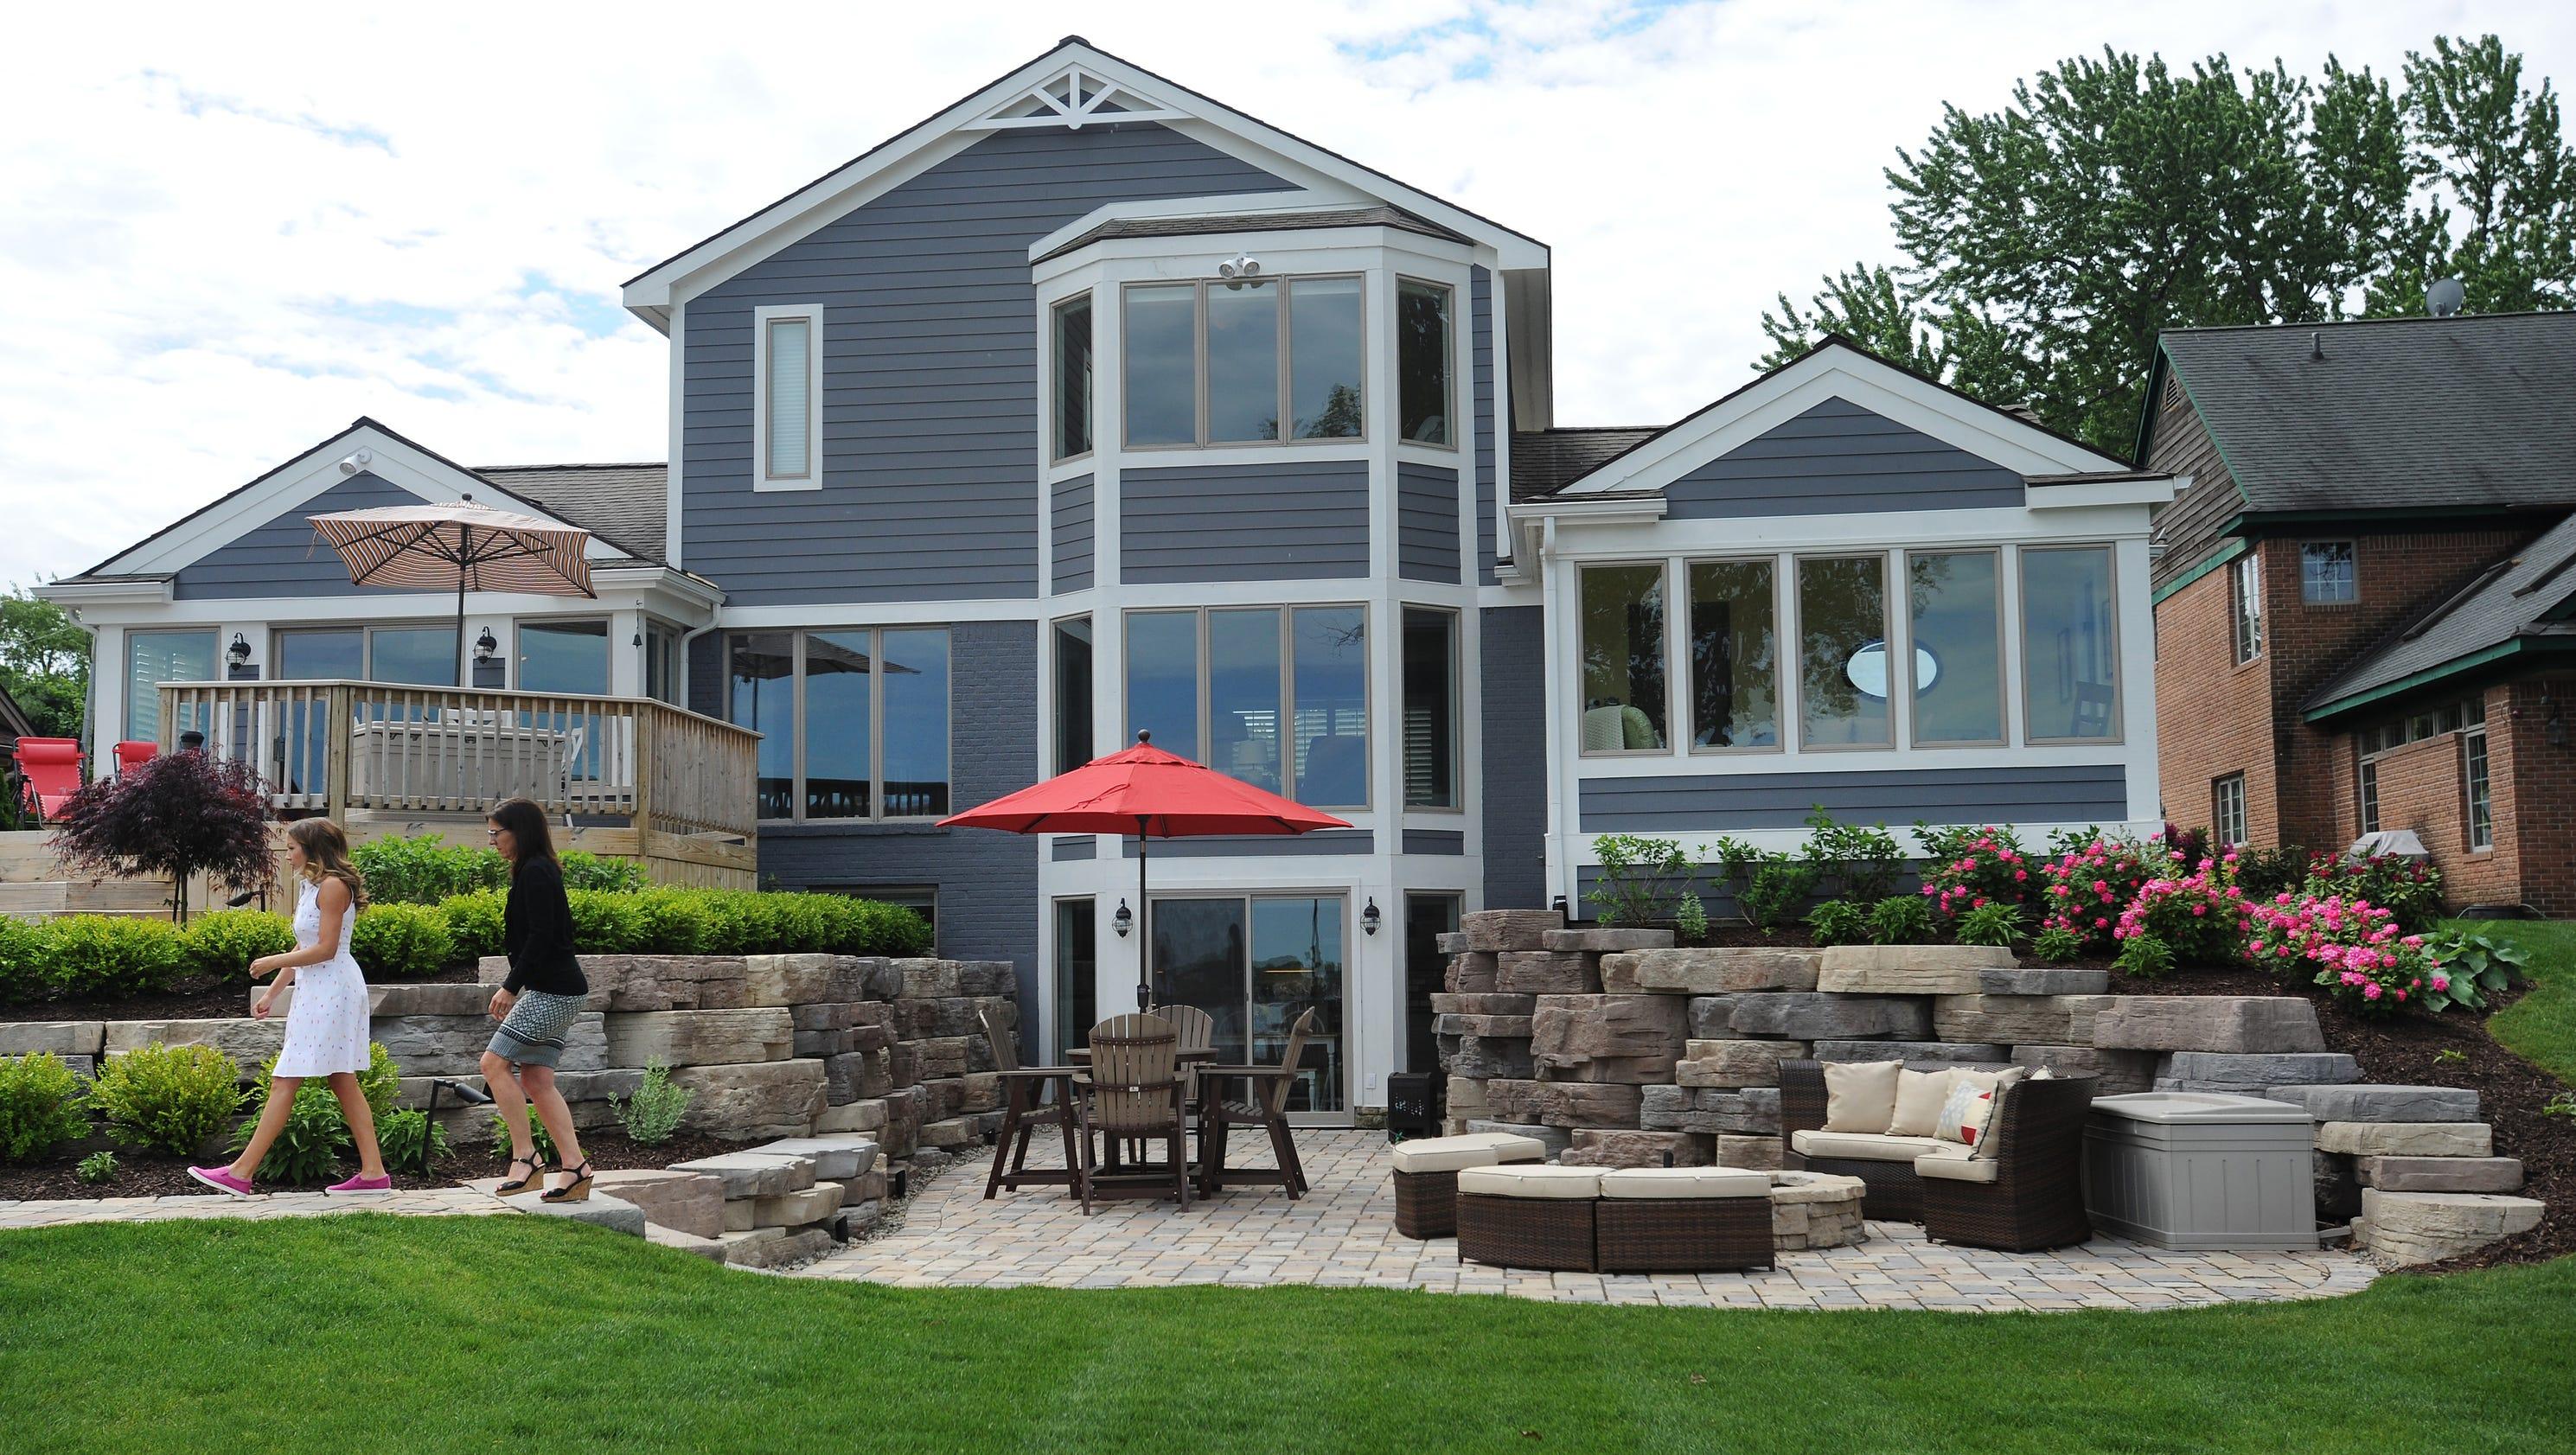 Sylvan lake home garden tour spotlights classic beach house for Classic house tour